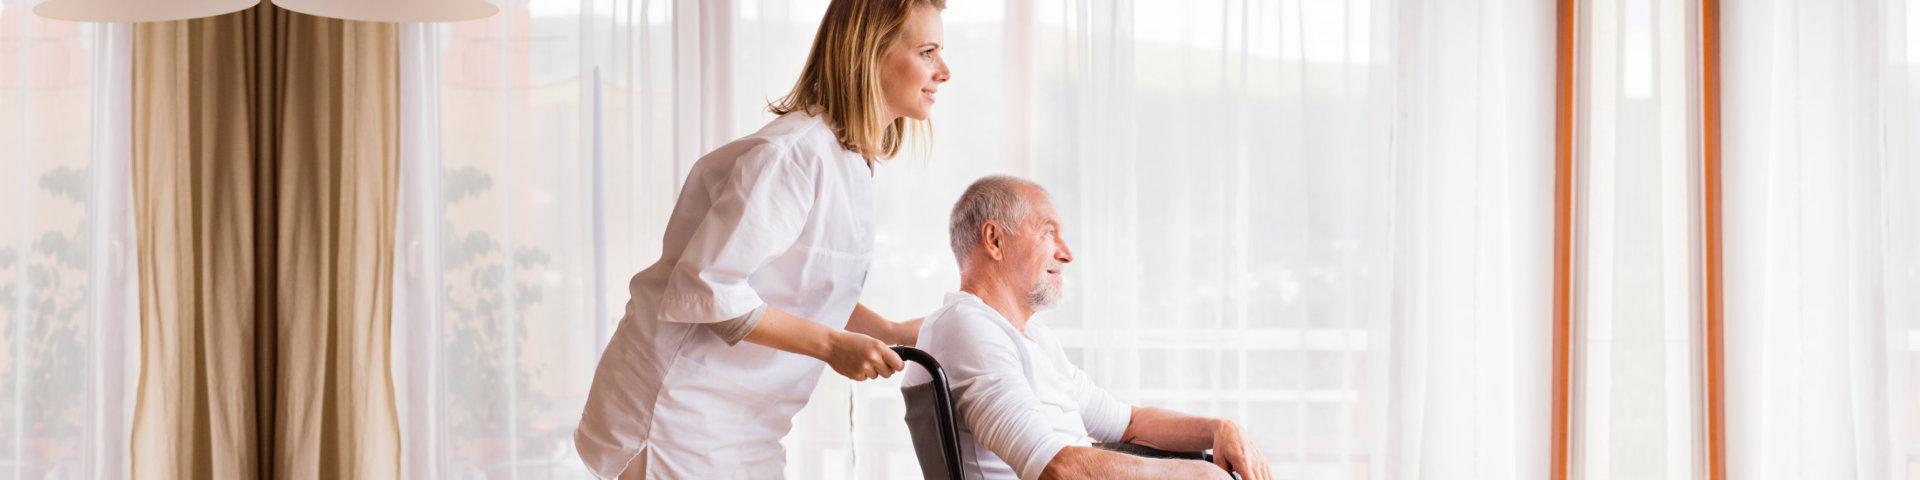 caregiver assisting a senior man on a wheelchair